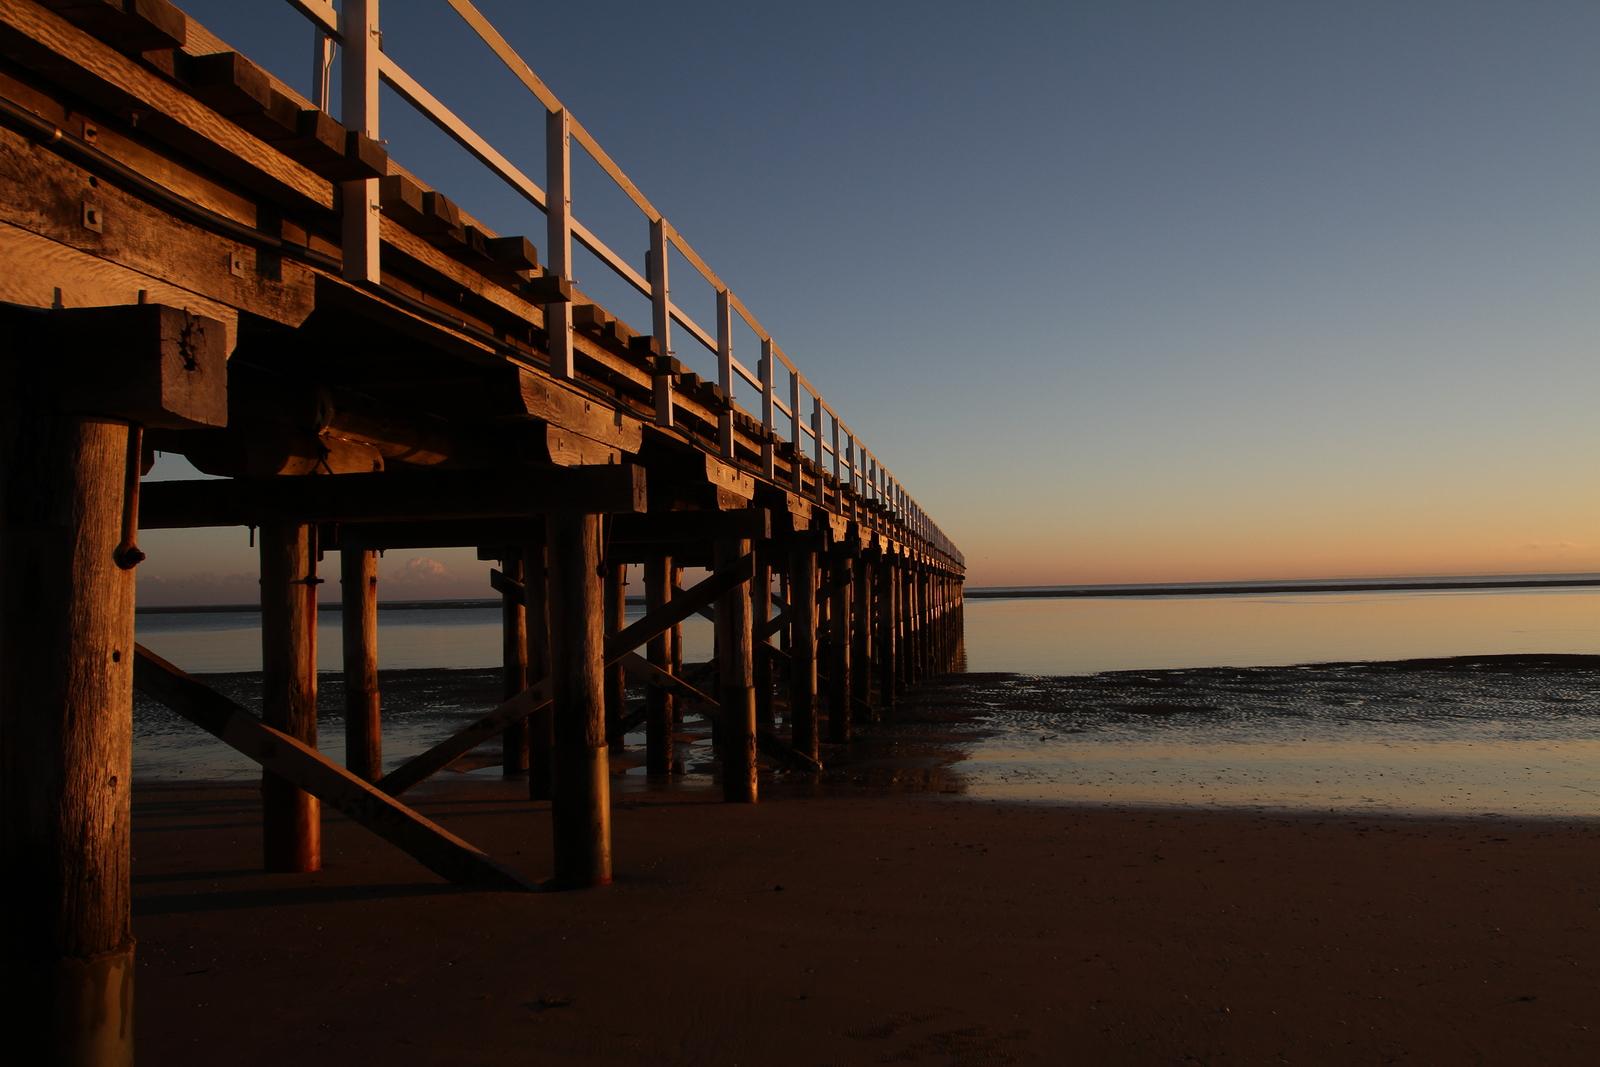 bigstock-Urangan-Pier-at-sunrise-5533574